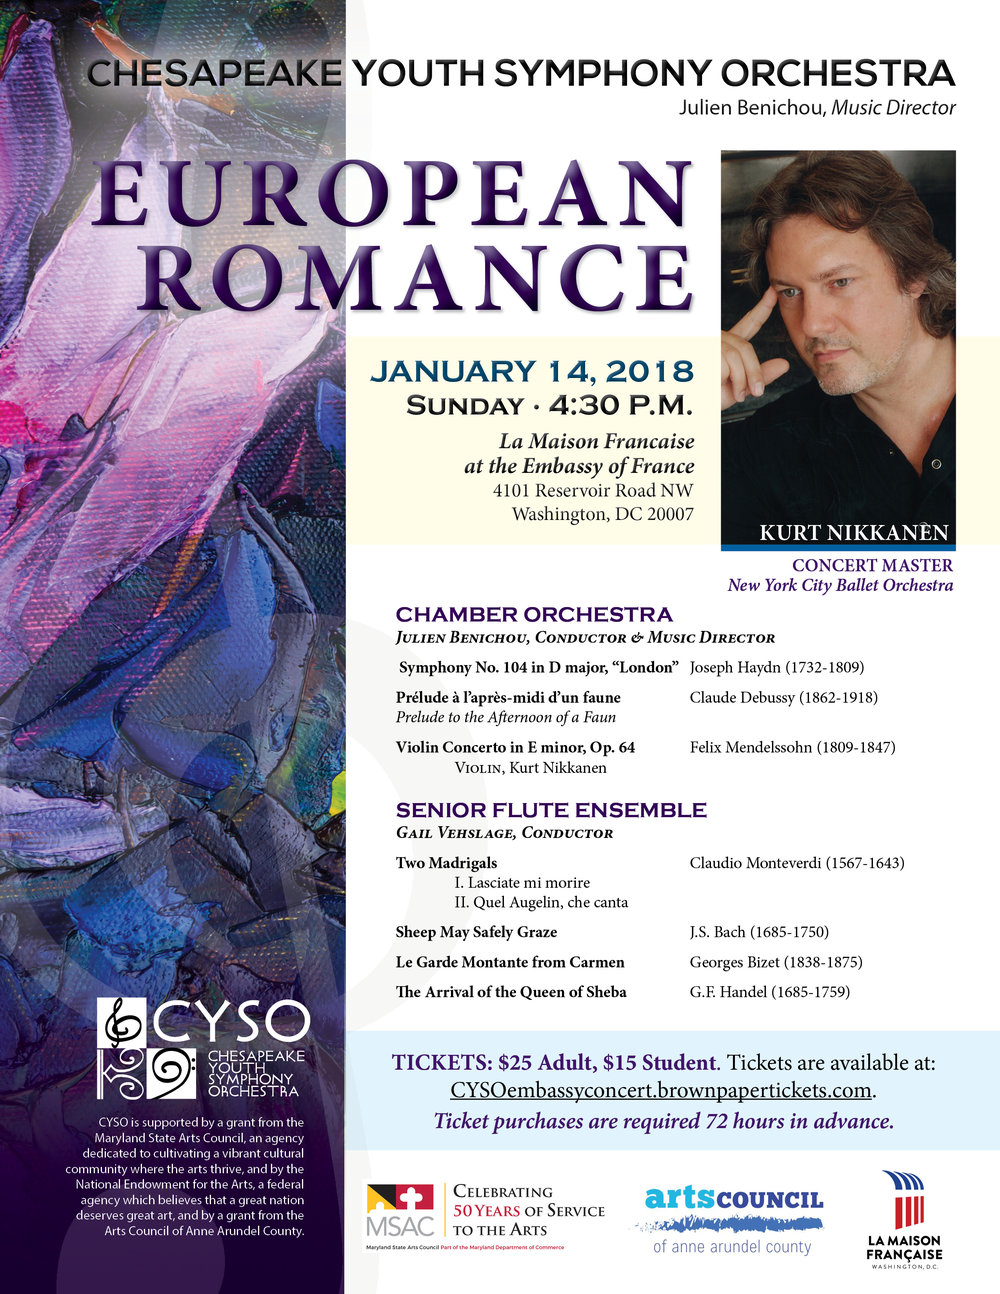 CYSO Embassy Concert Flyer.jpg